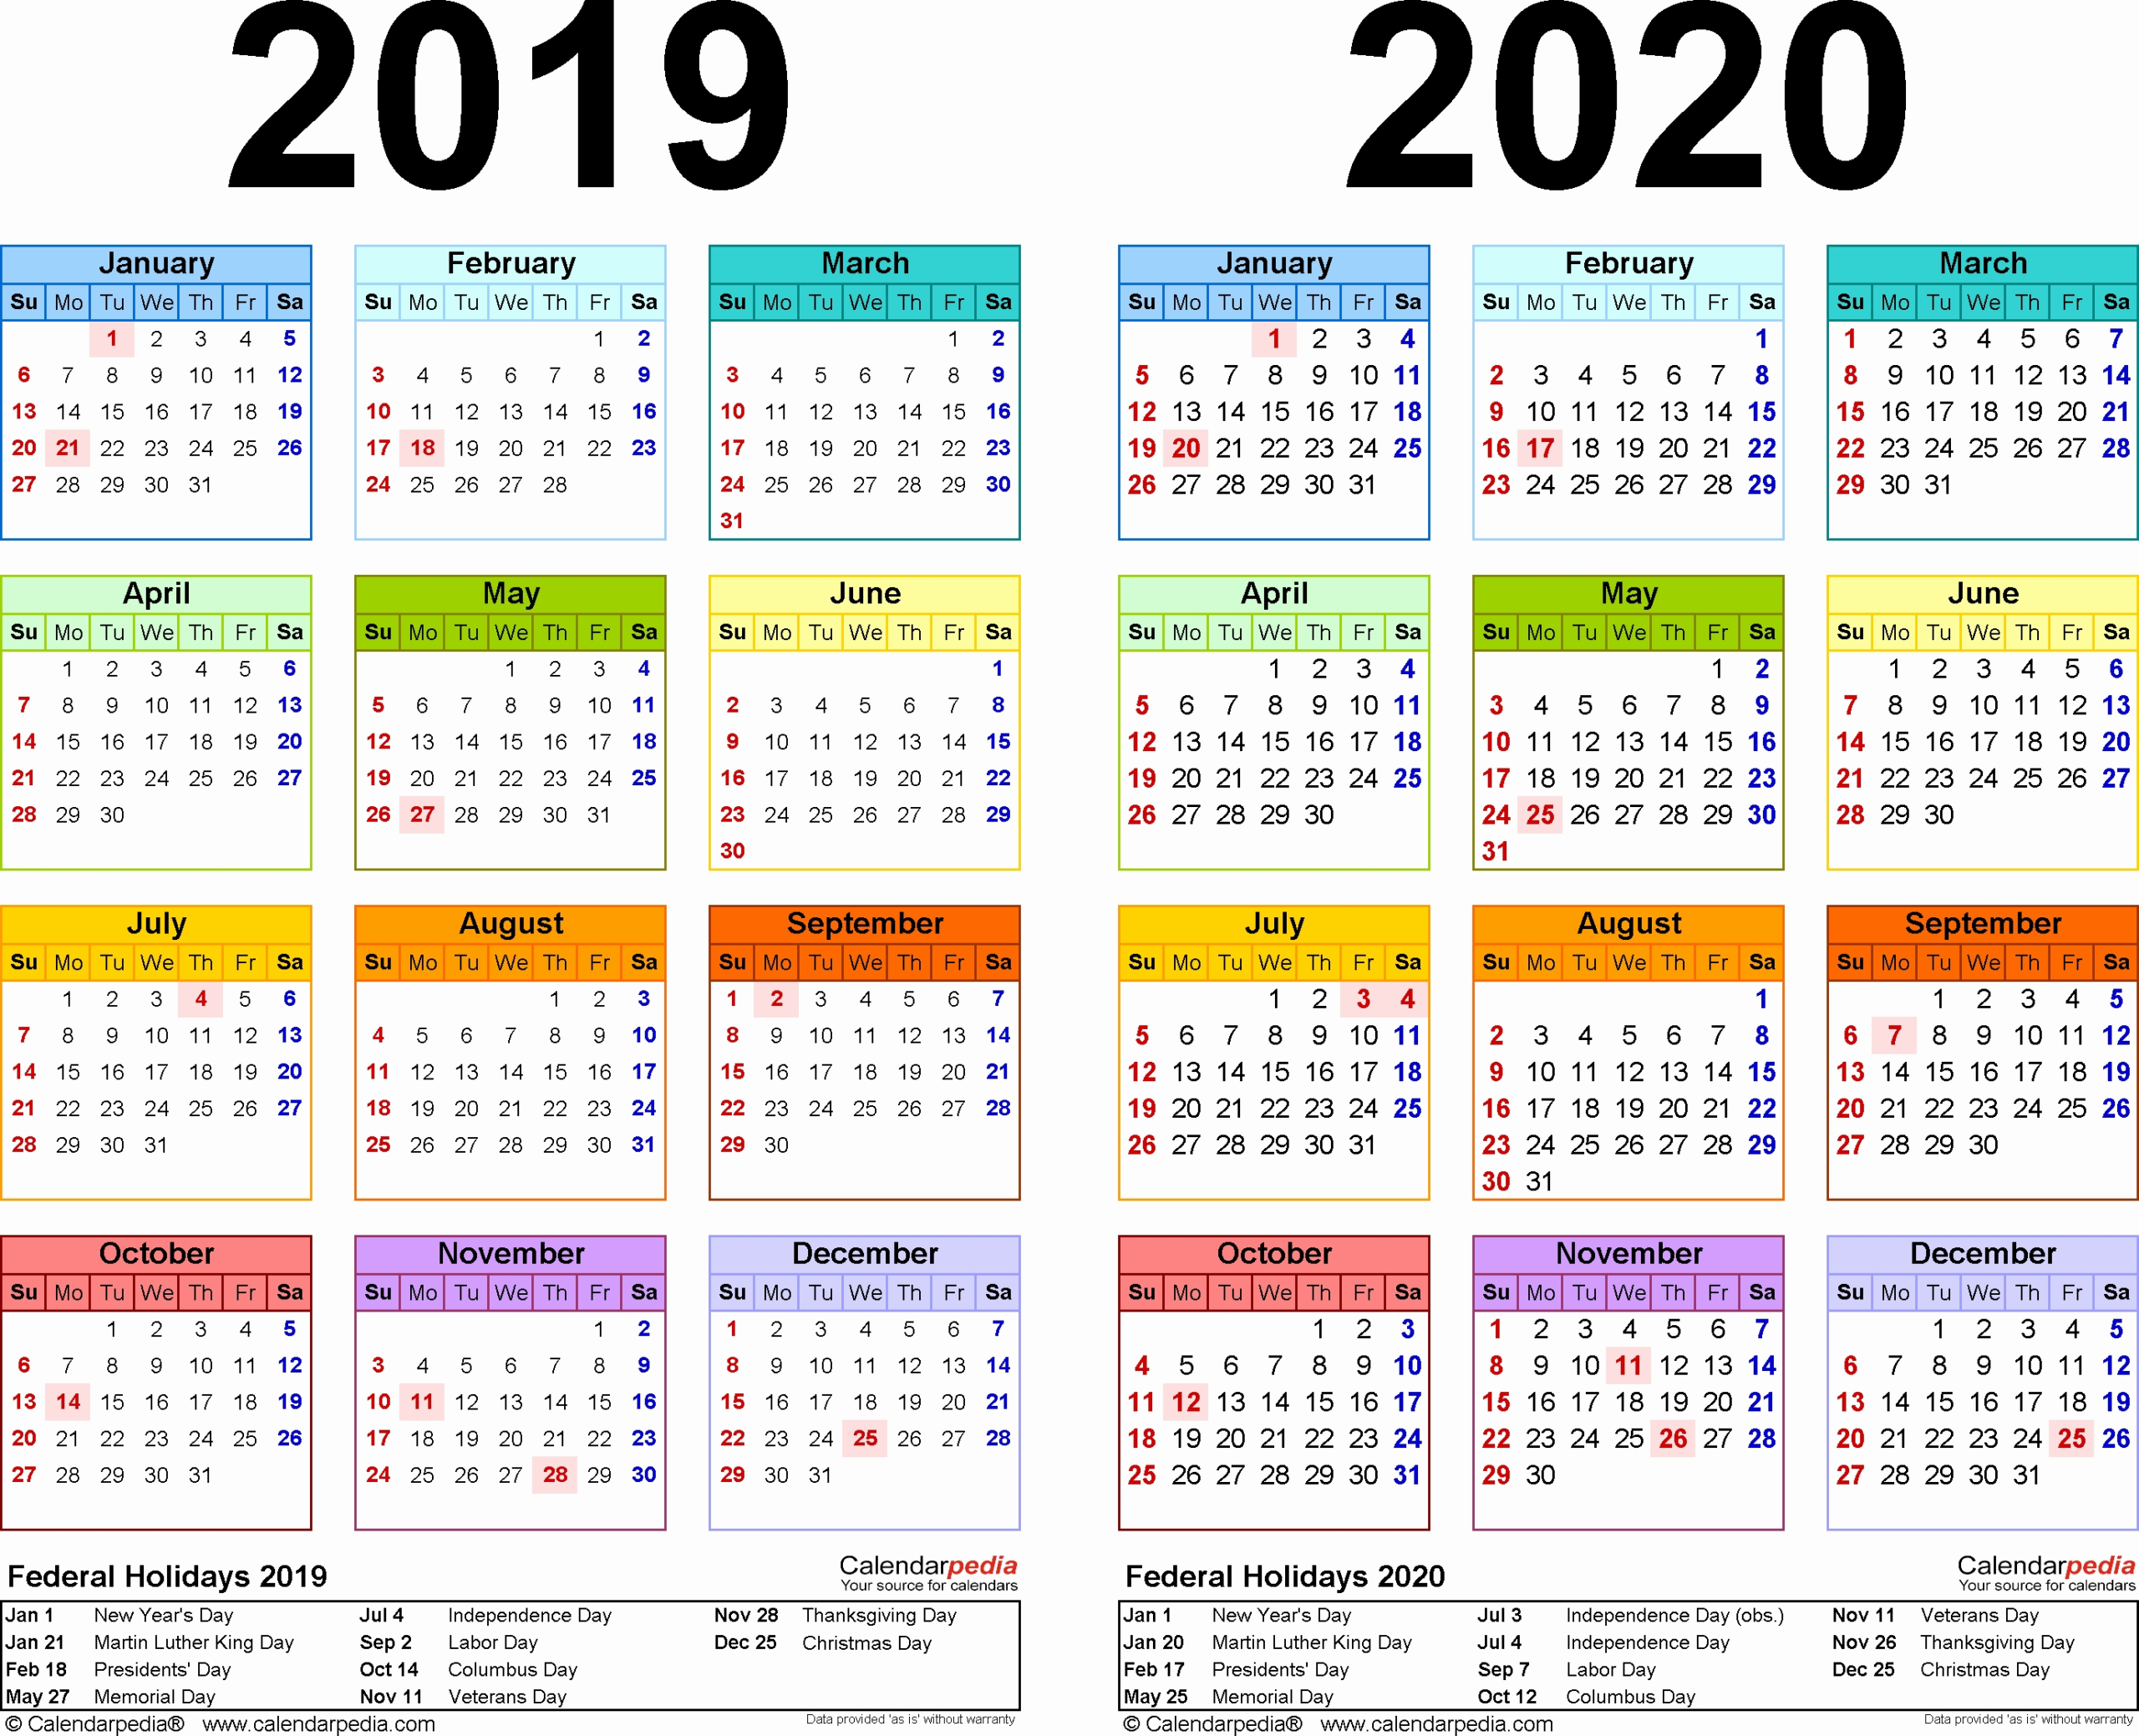 Federal Holiday Calendar 2020 | Lifehacked1St